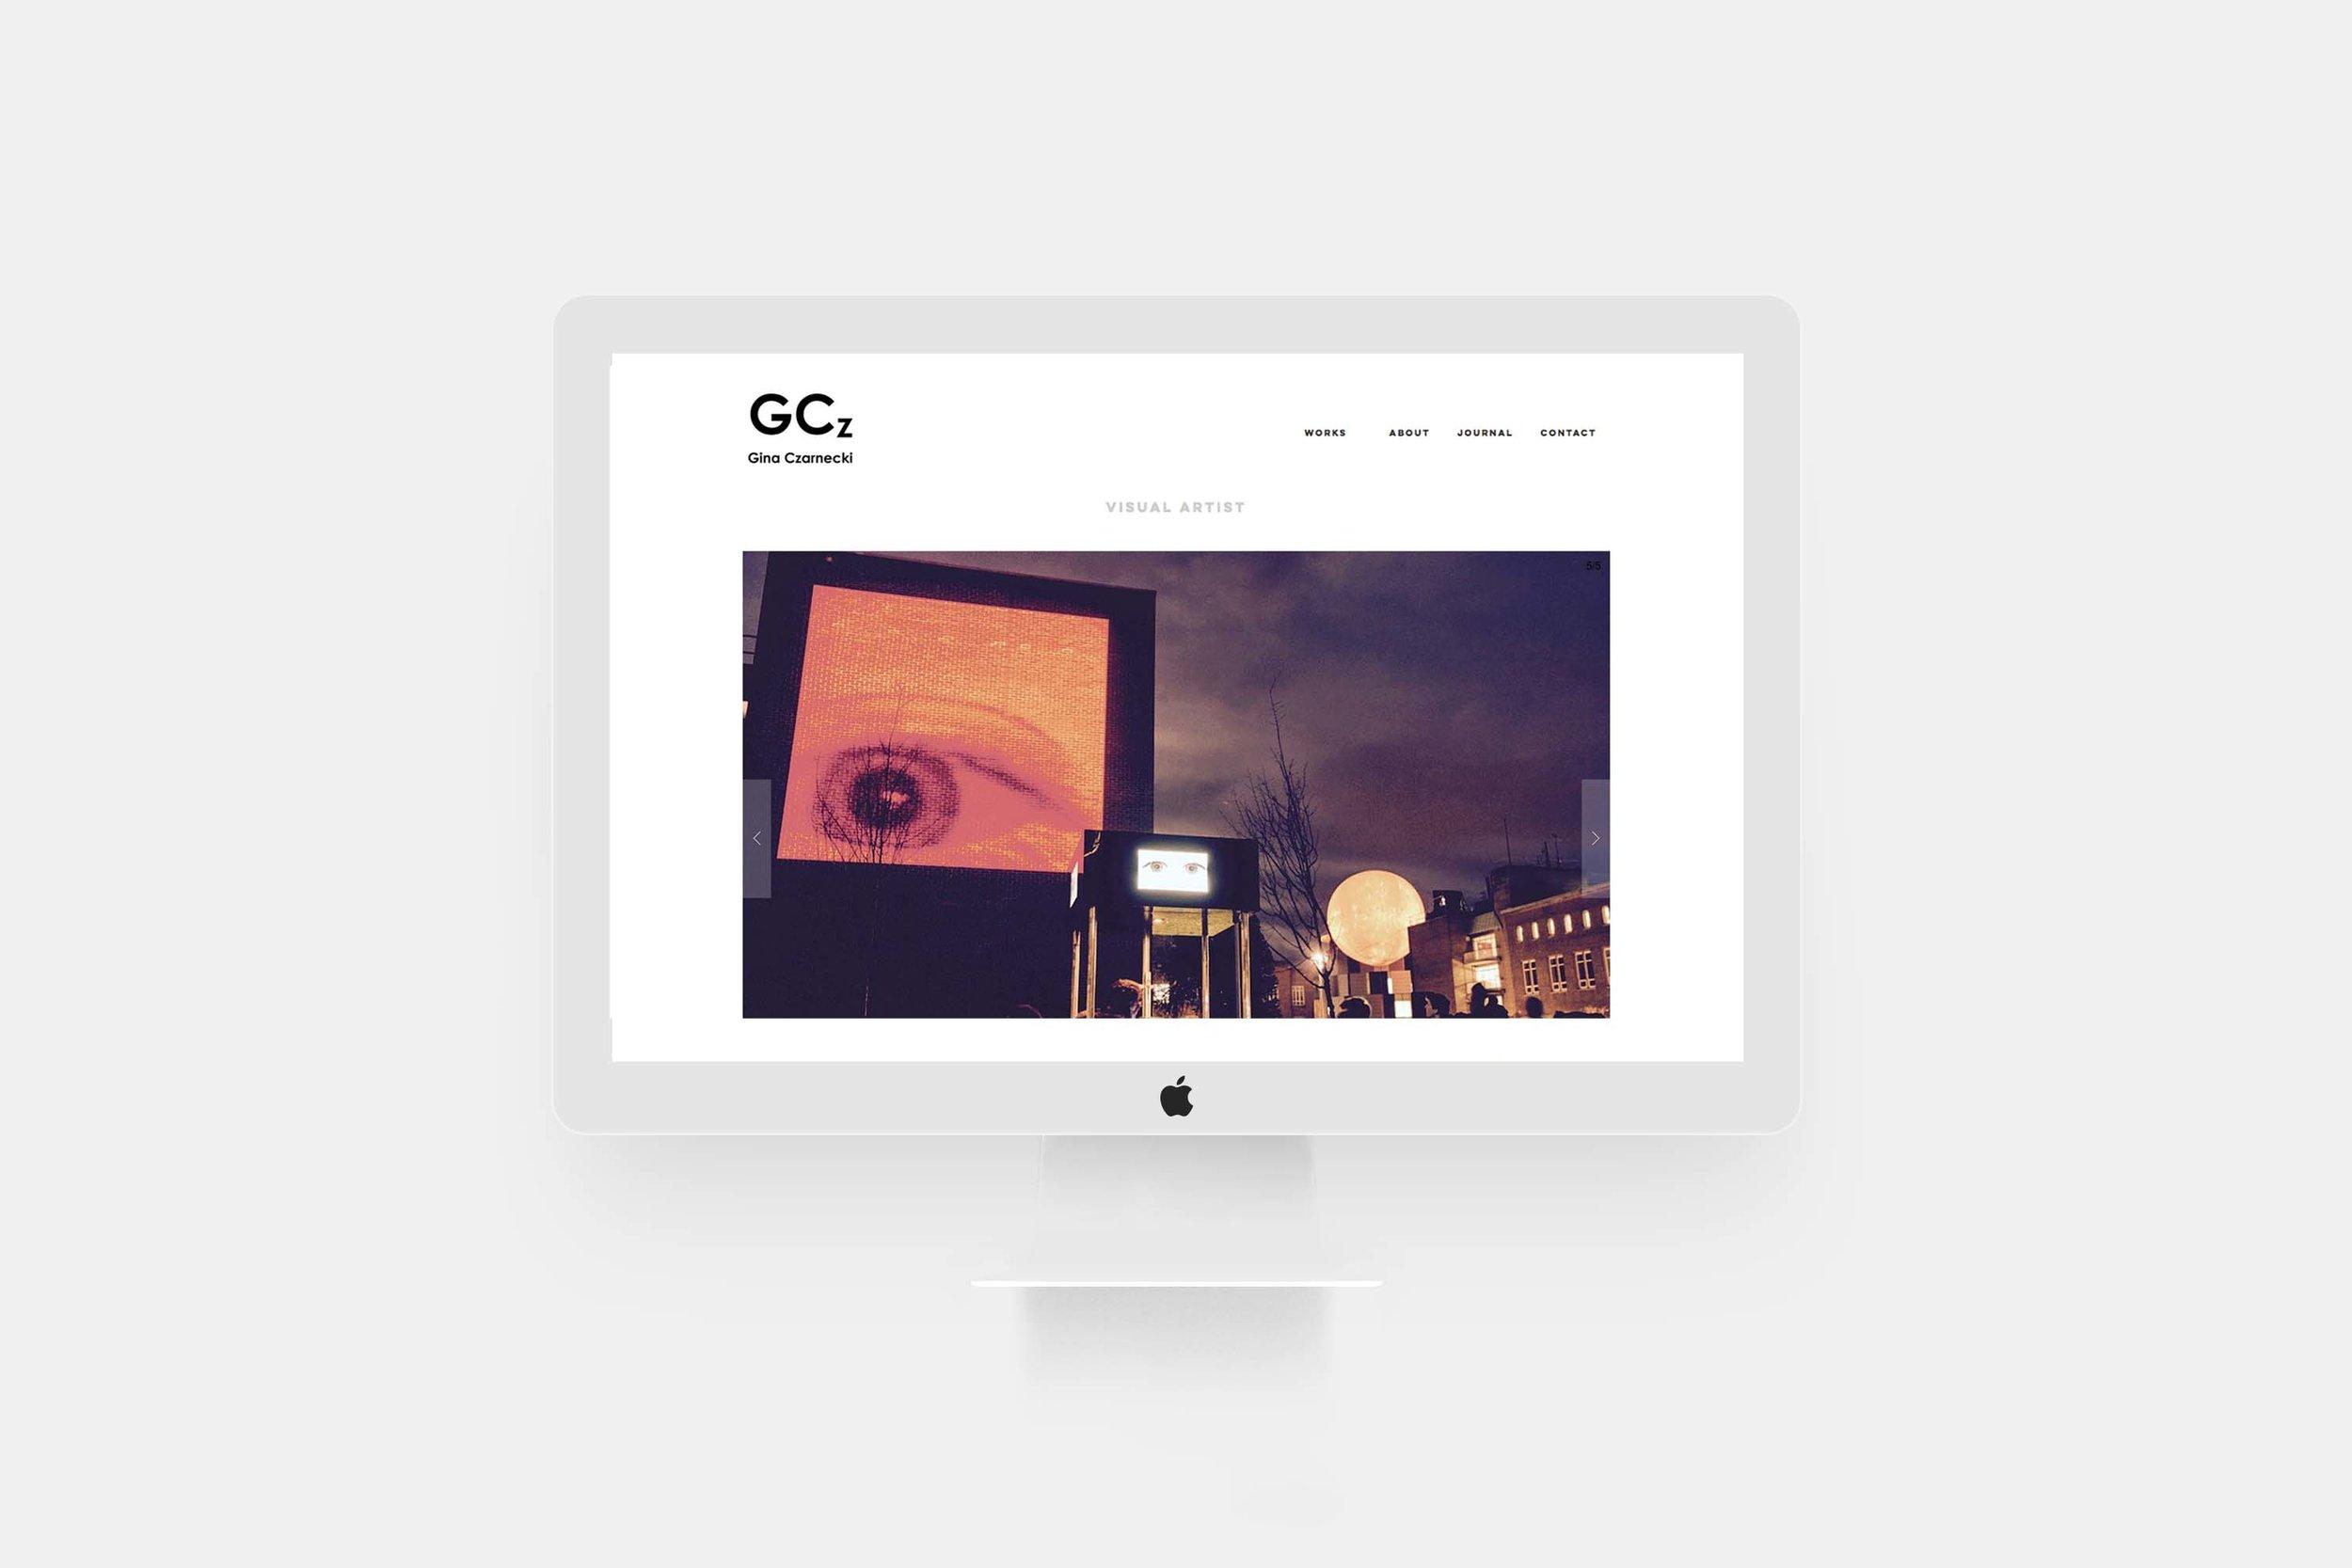 GCz - iMac - Home-i.jpg